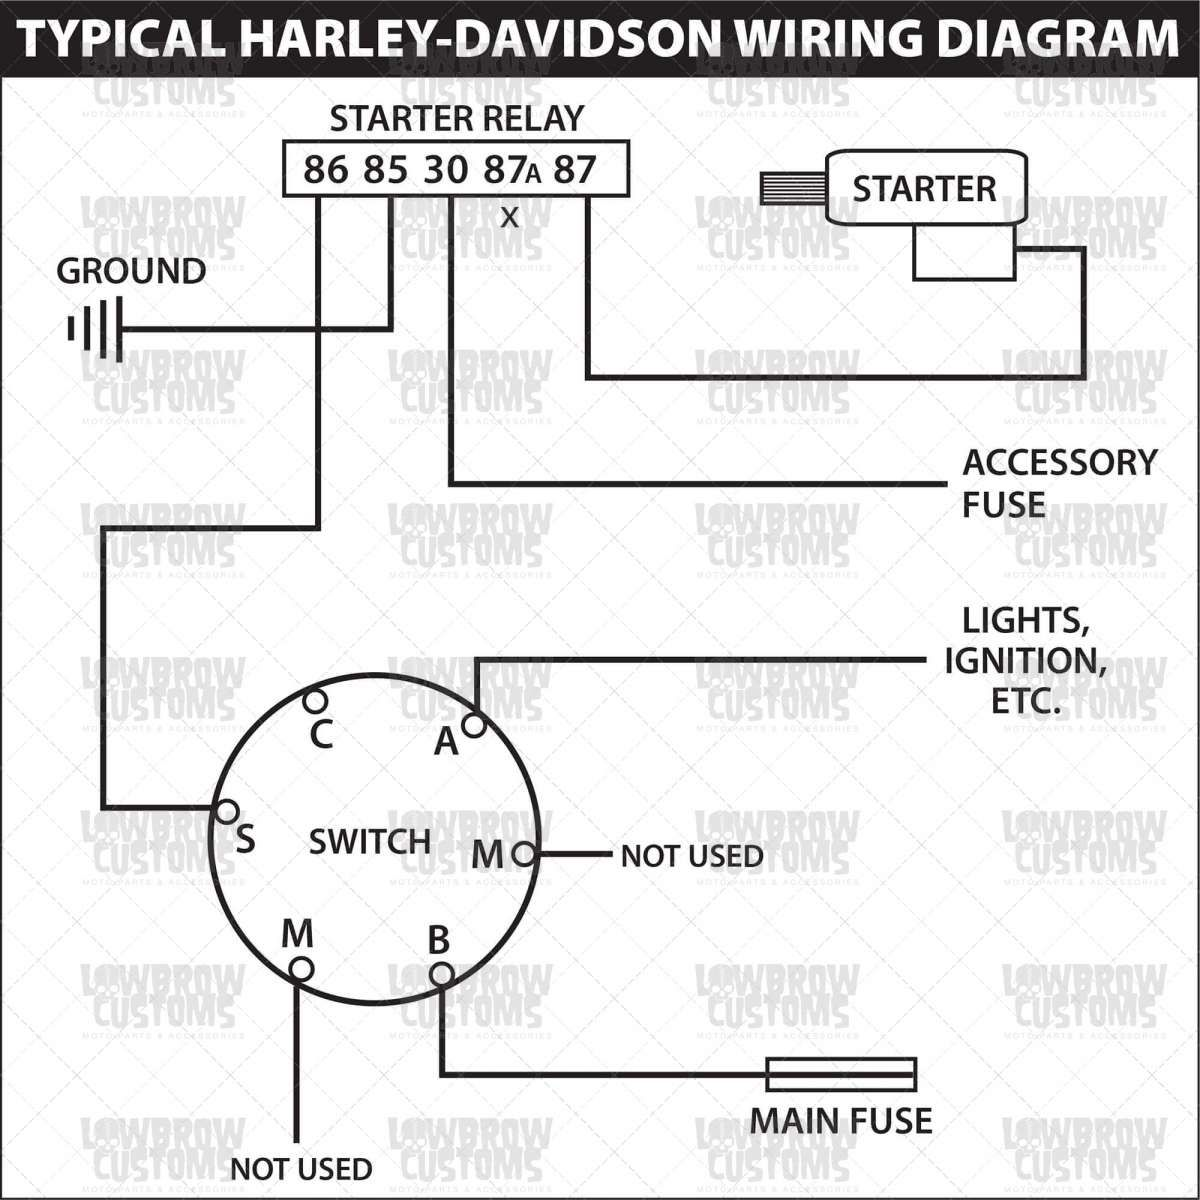 Wiring Diagram Ignition Switch Harley Davidson